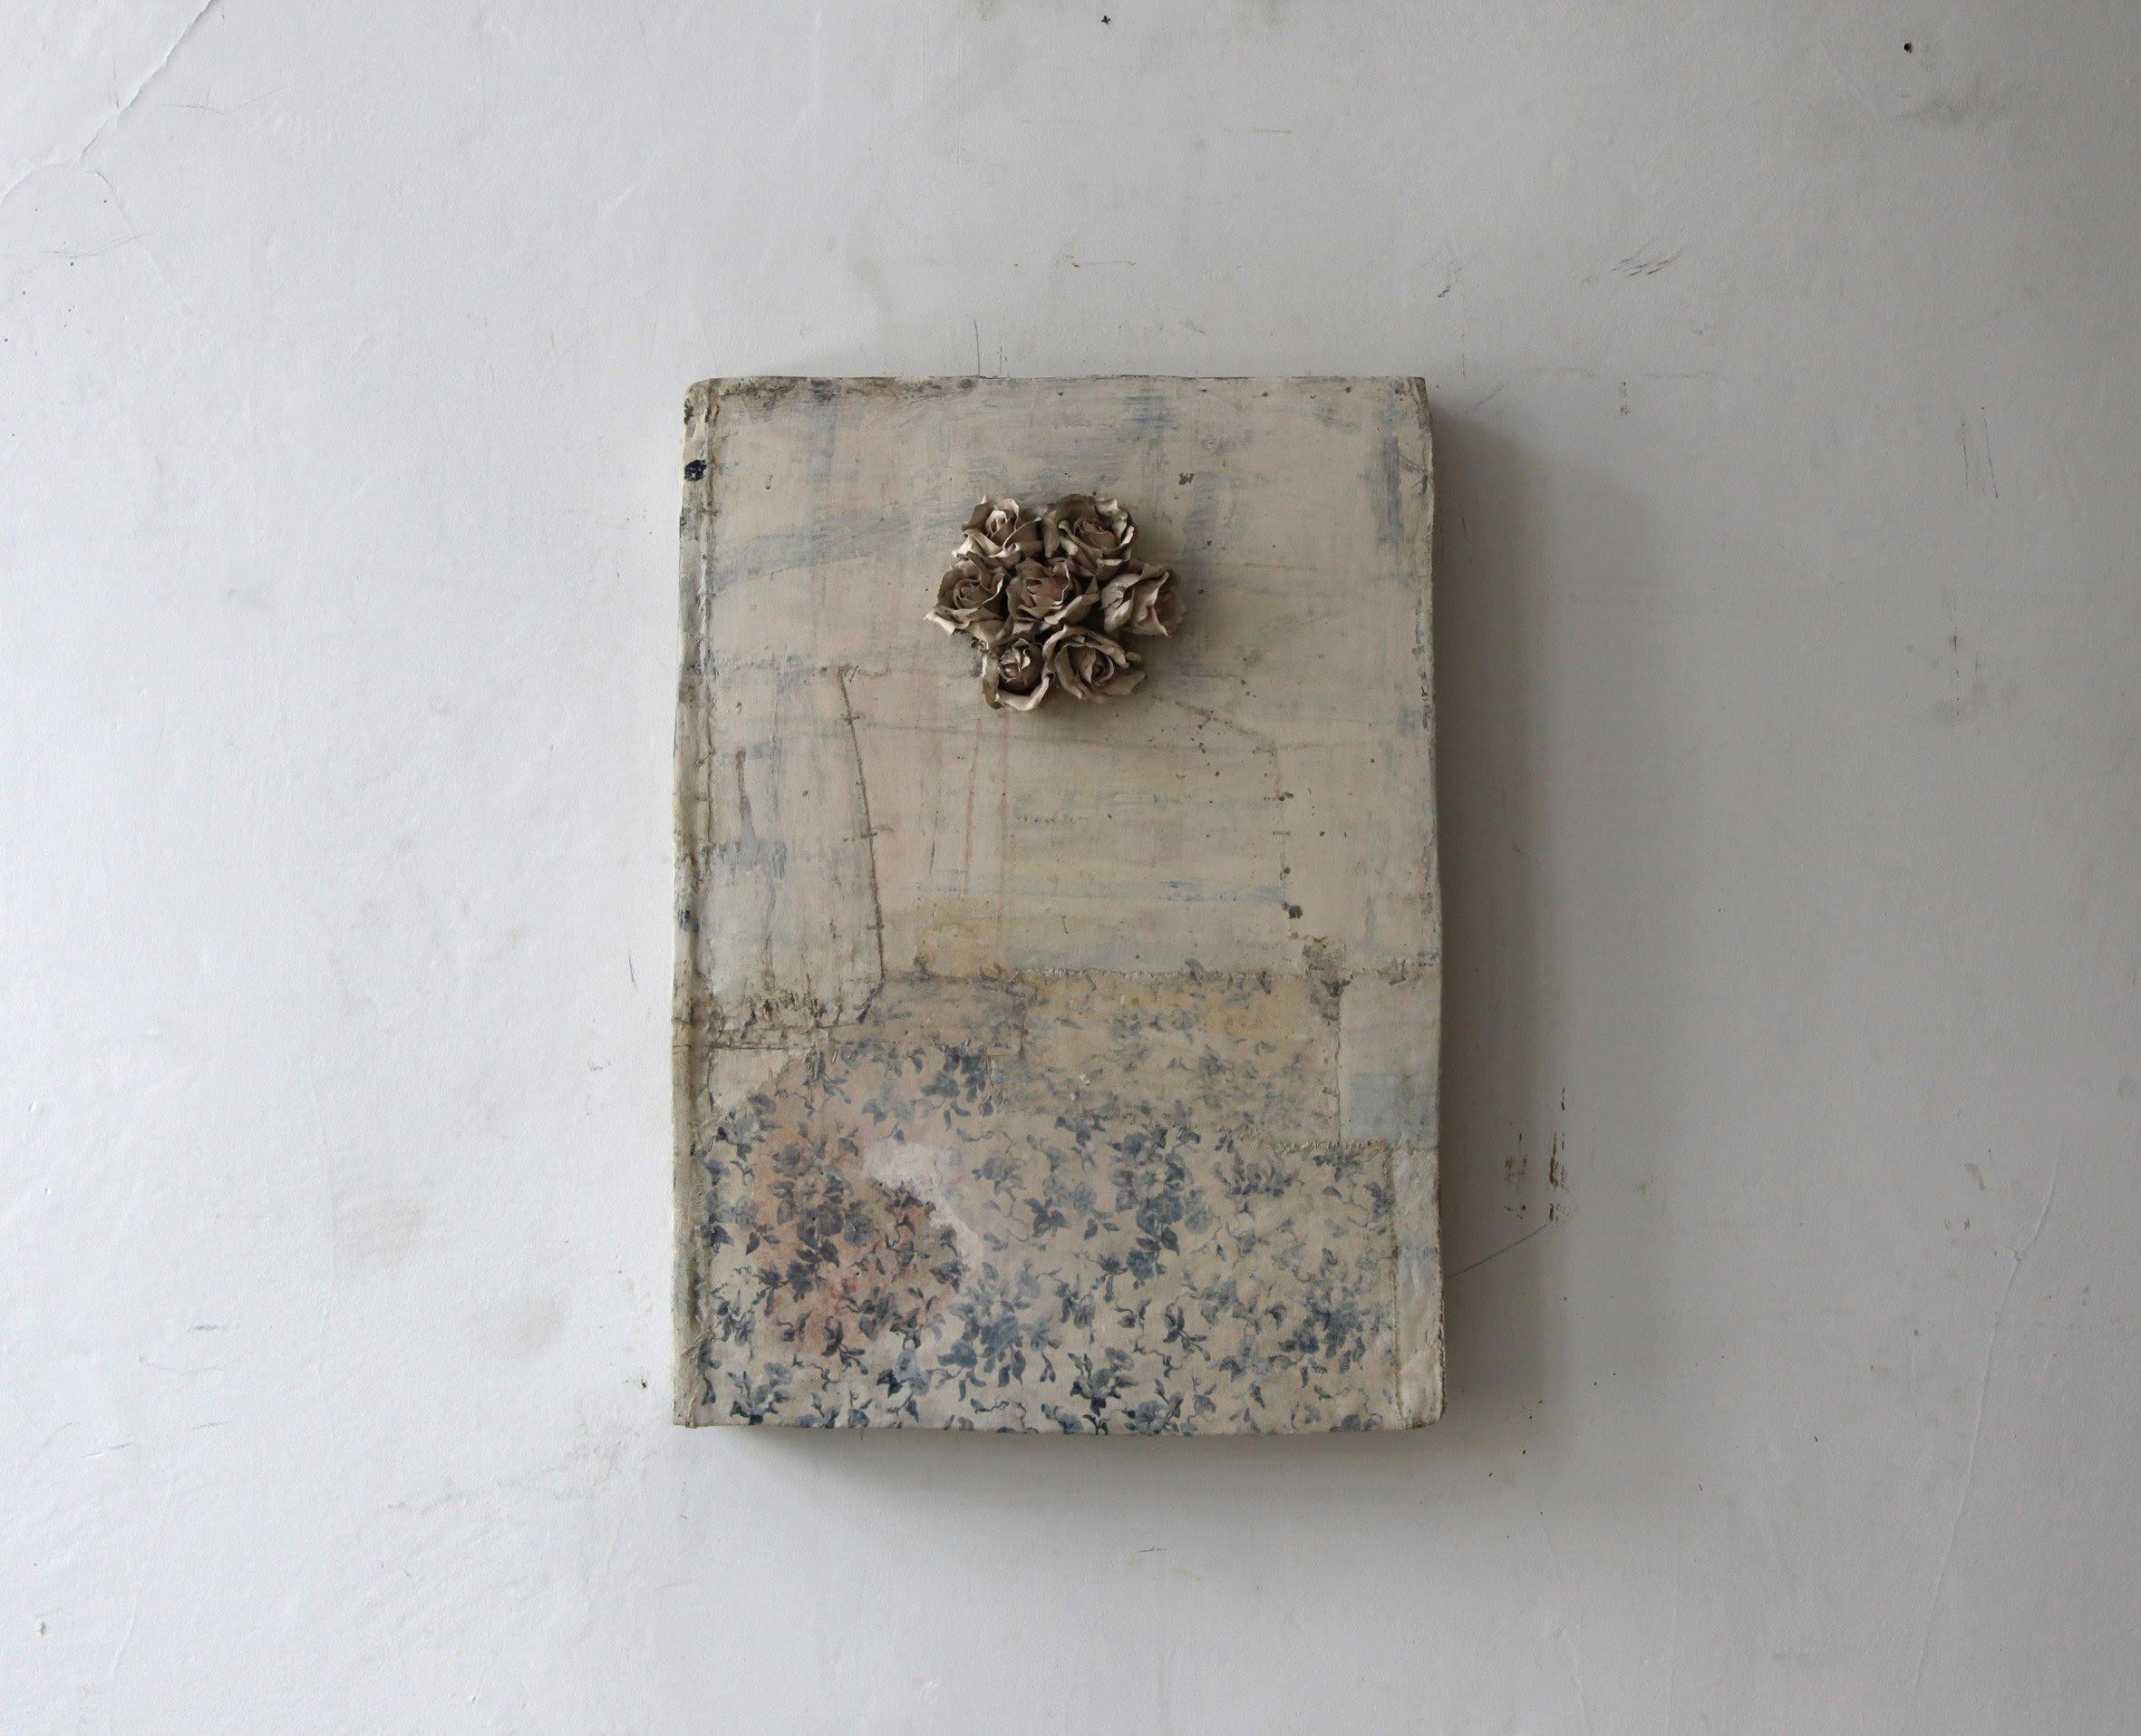 lawrence carroll @ minimal exposition